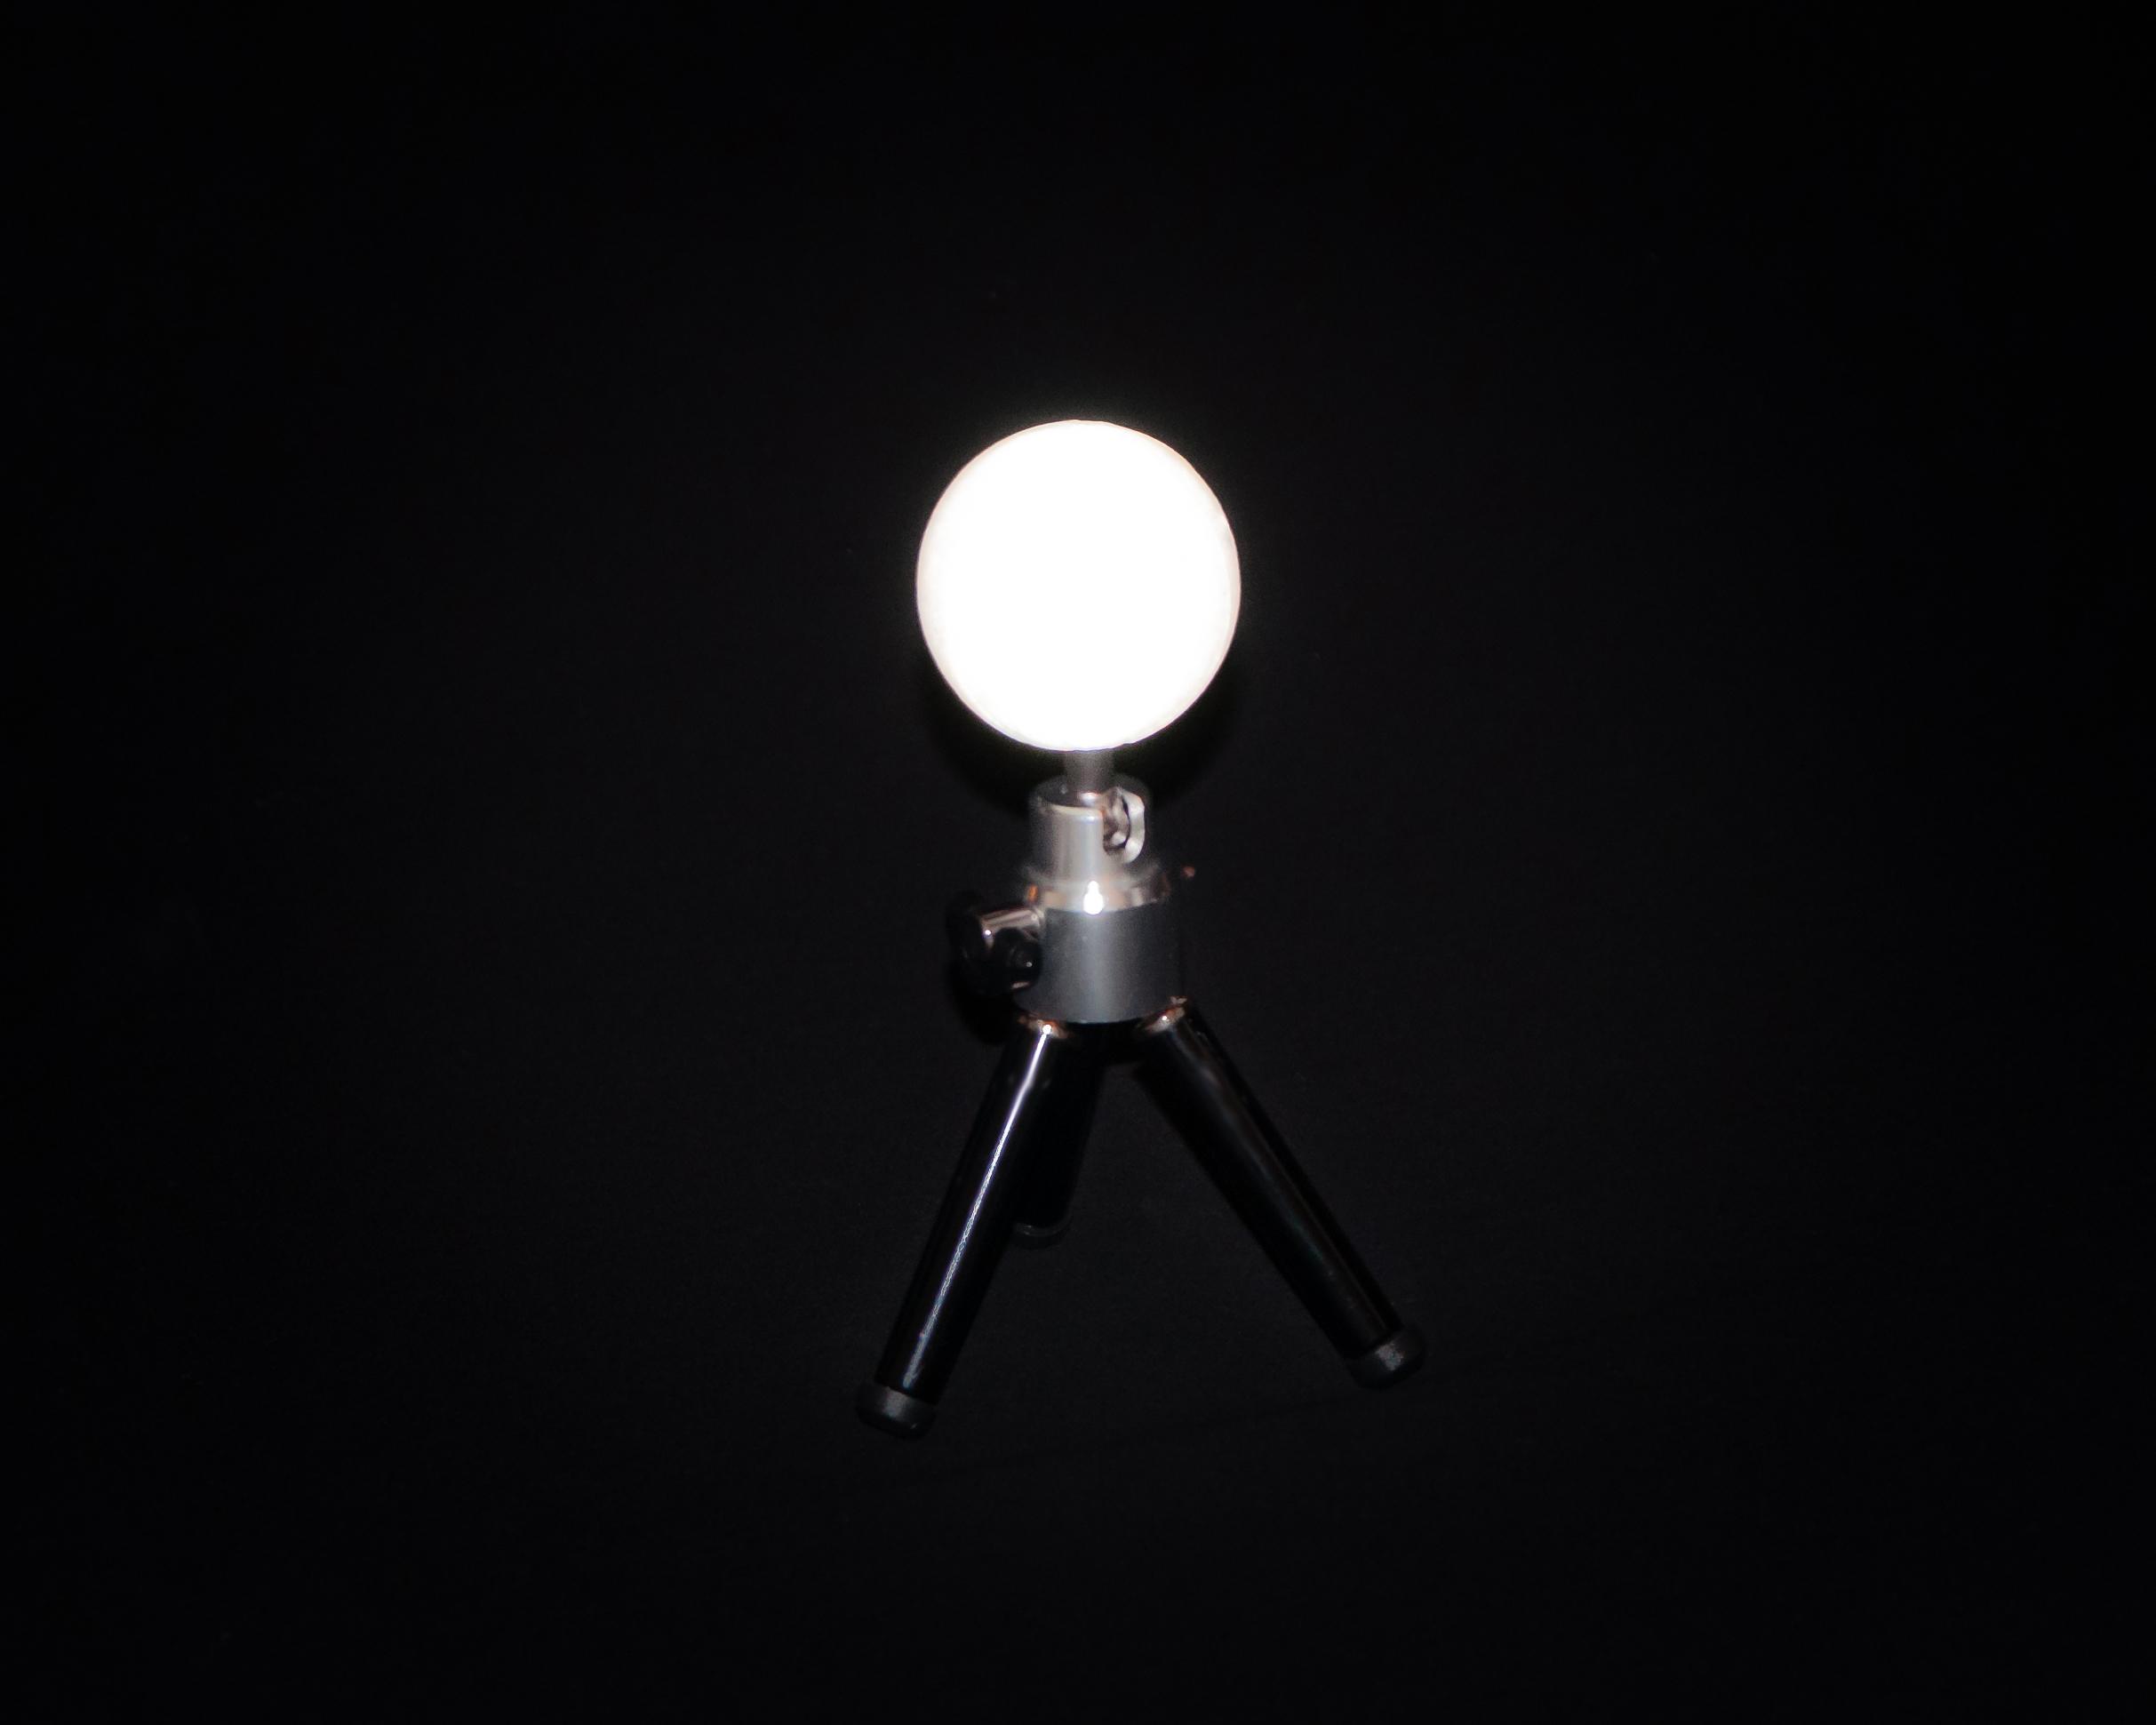 Retroreflective, spherical target for photogrammetry.